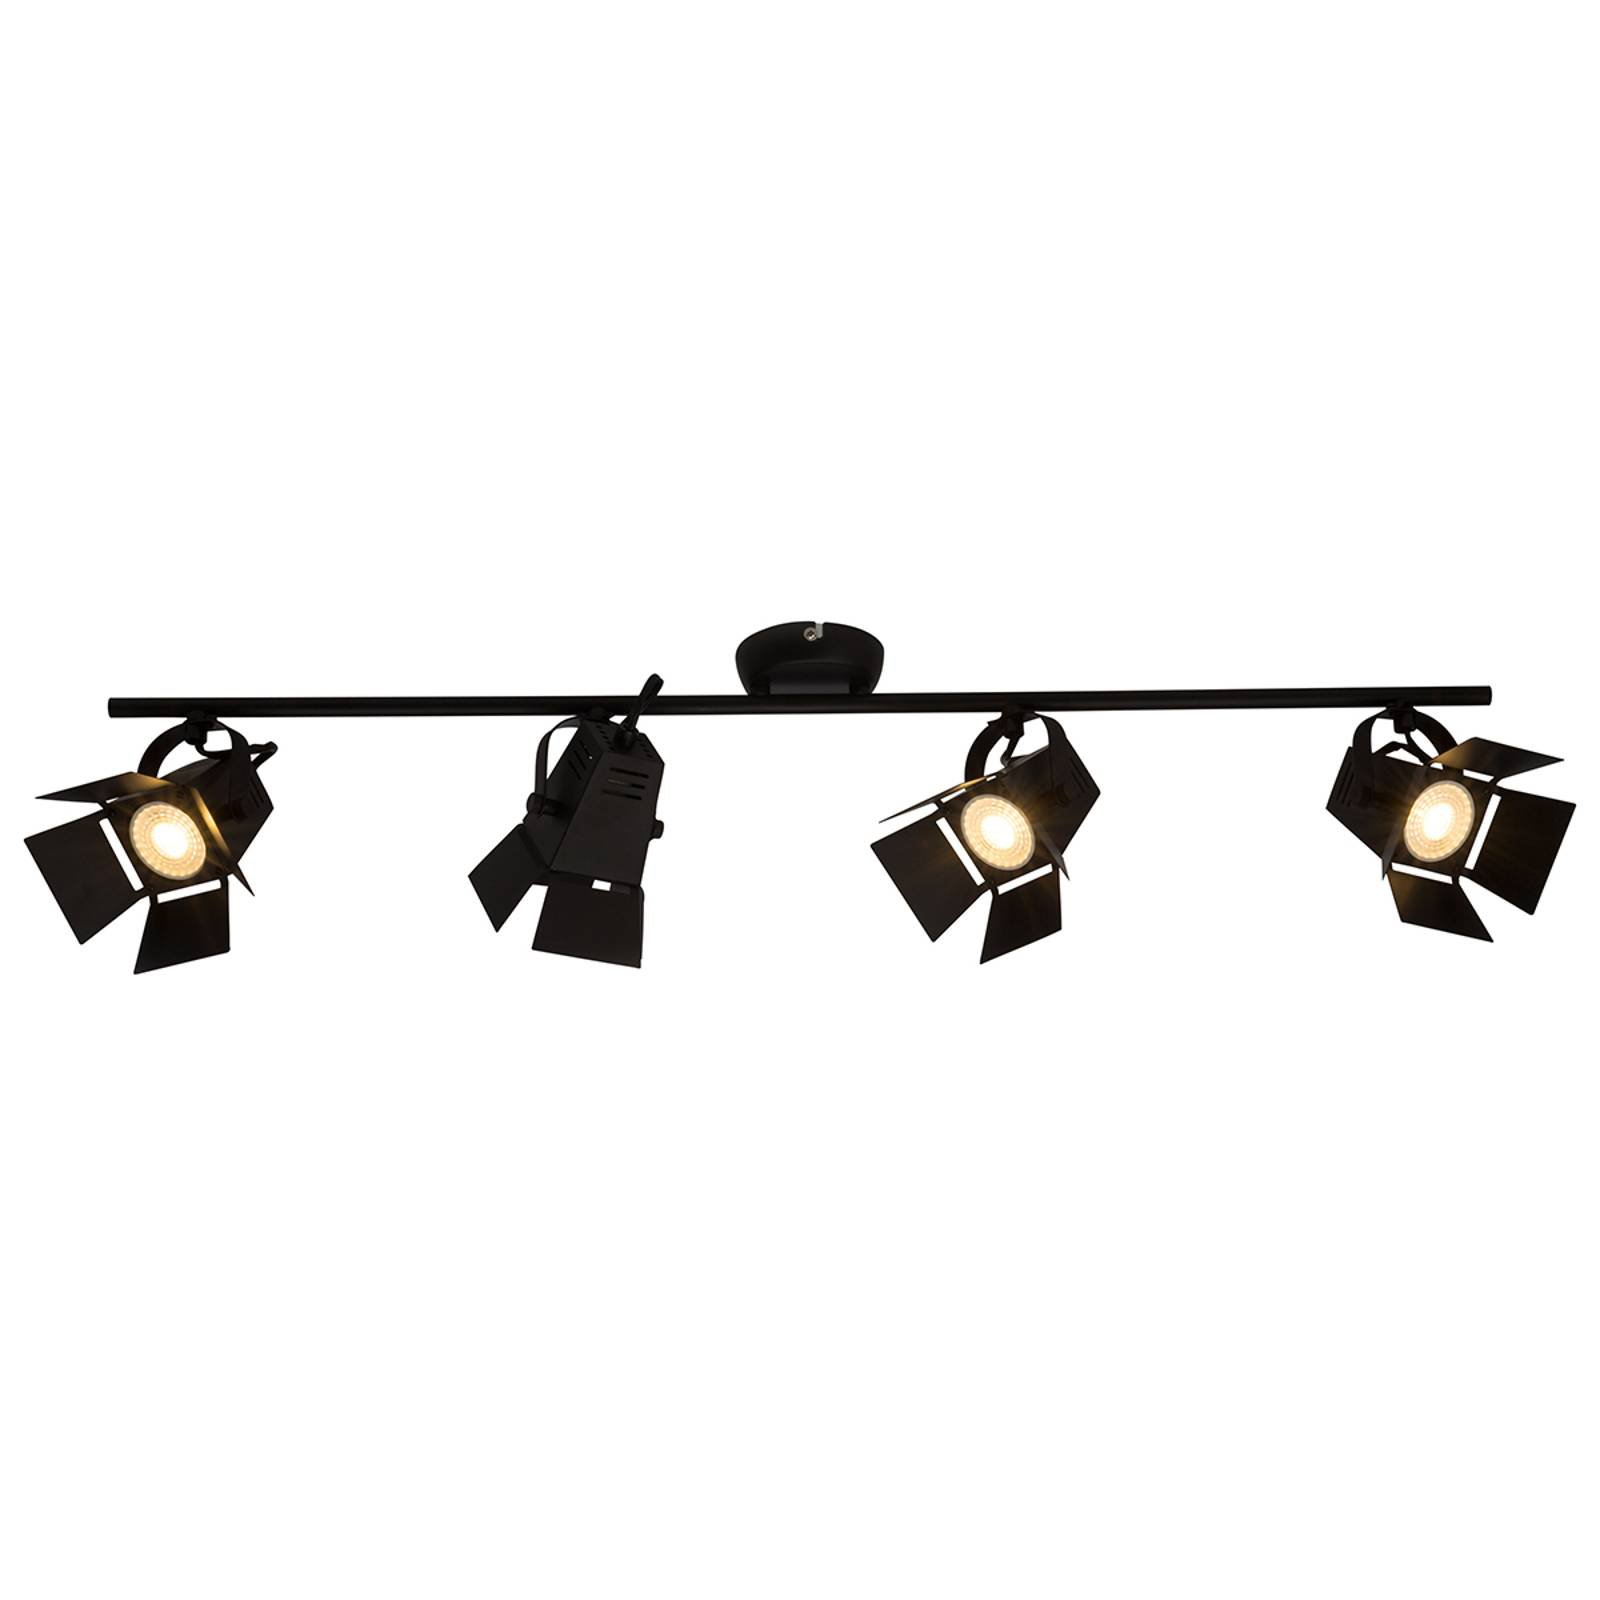 Movie - moderne LED spot taklampe, svart